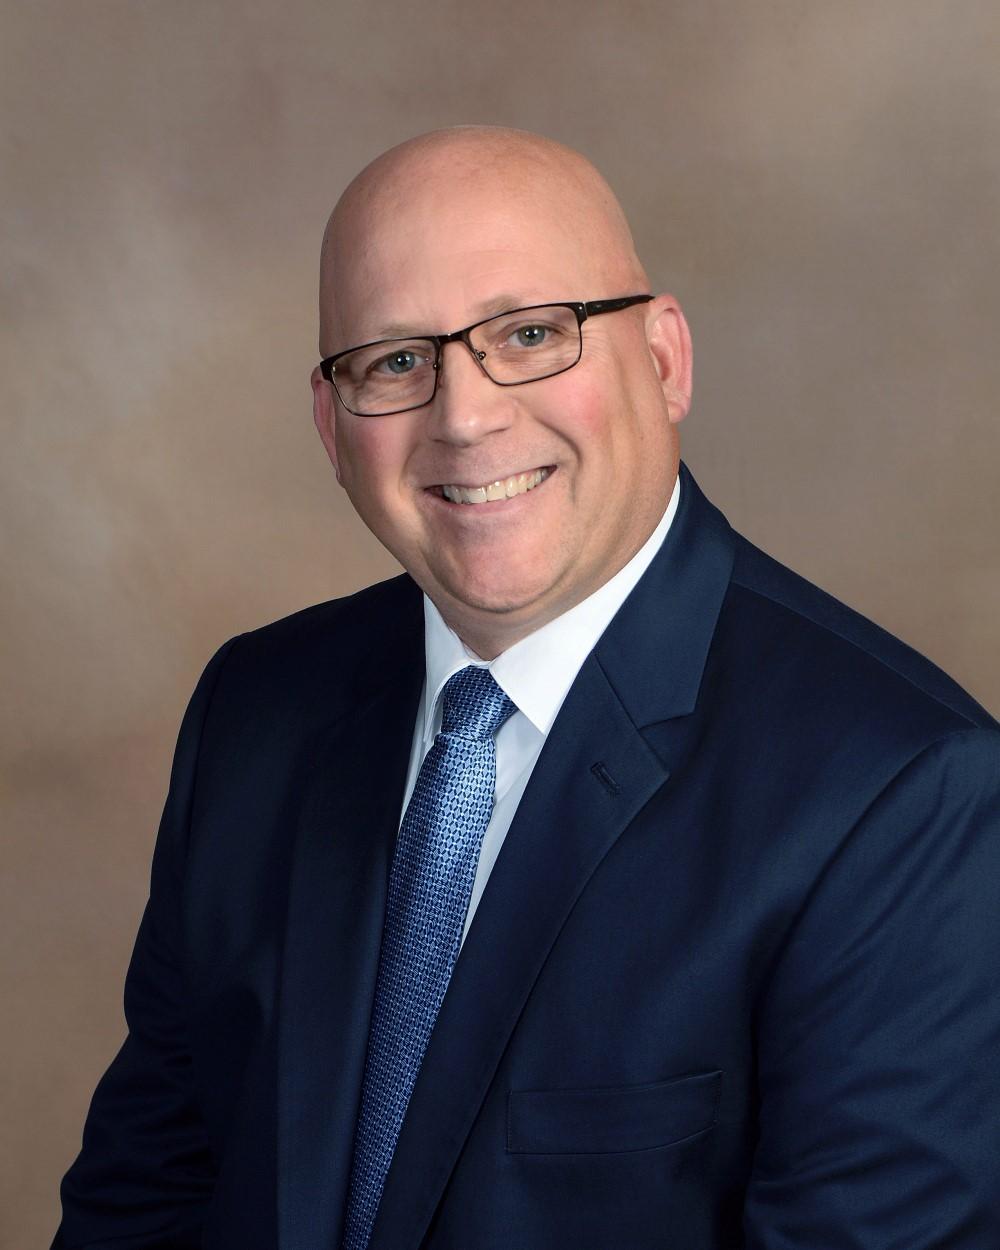 J. Douglas Hilliard, Sr. Business Coach